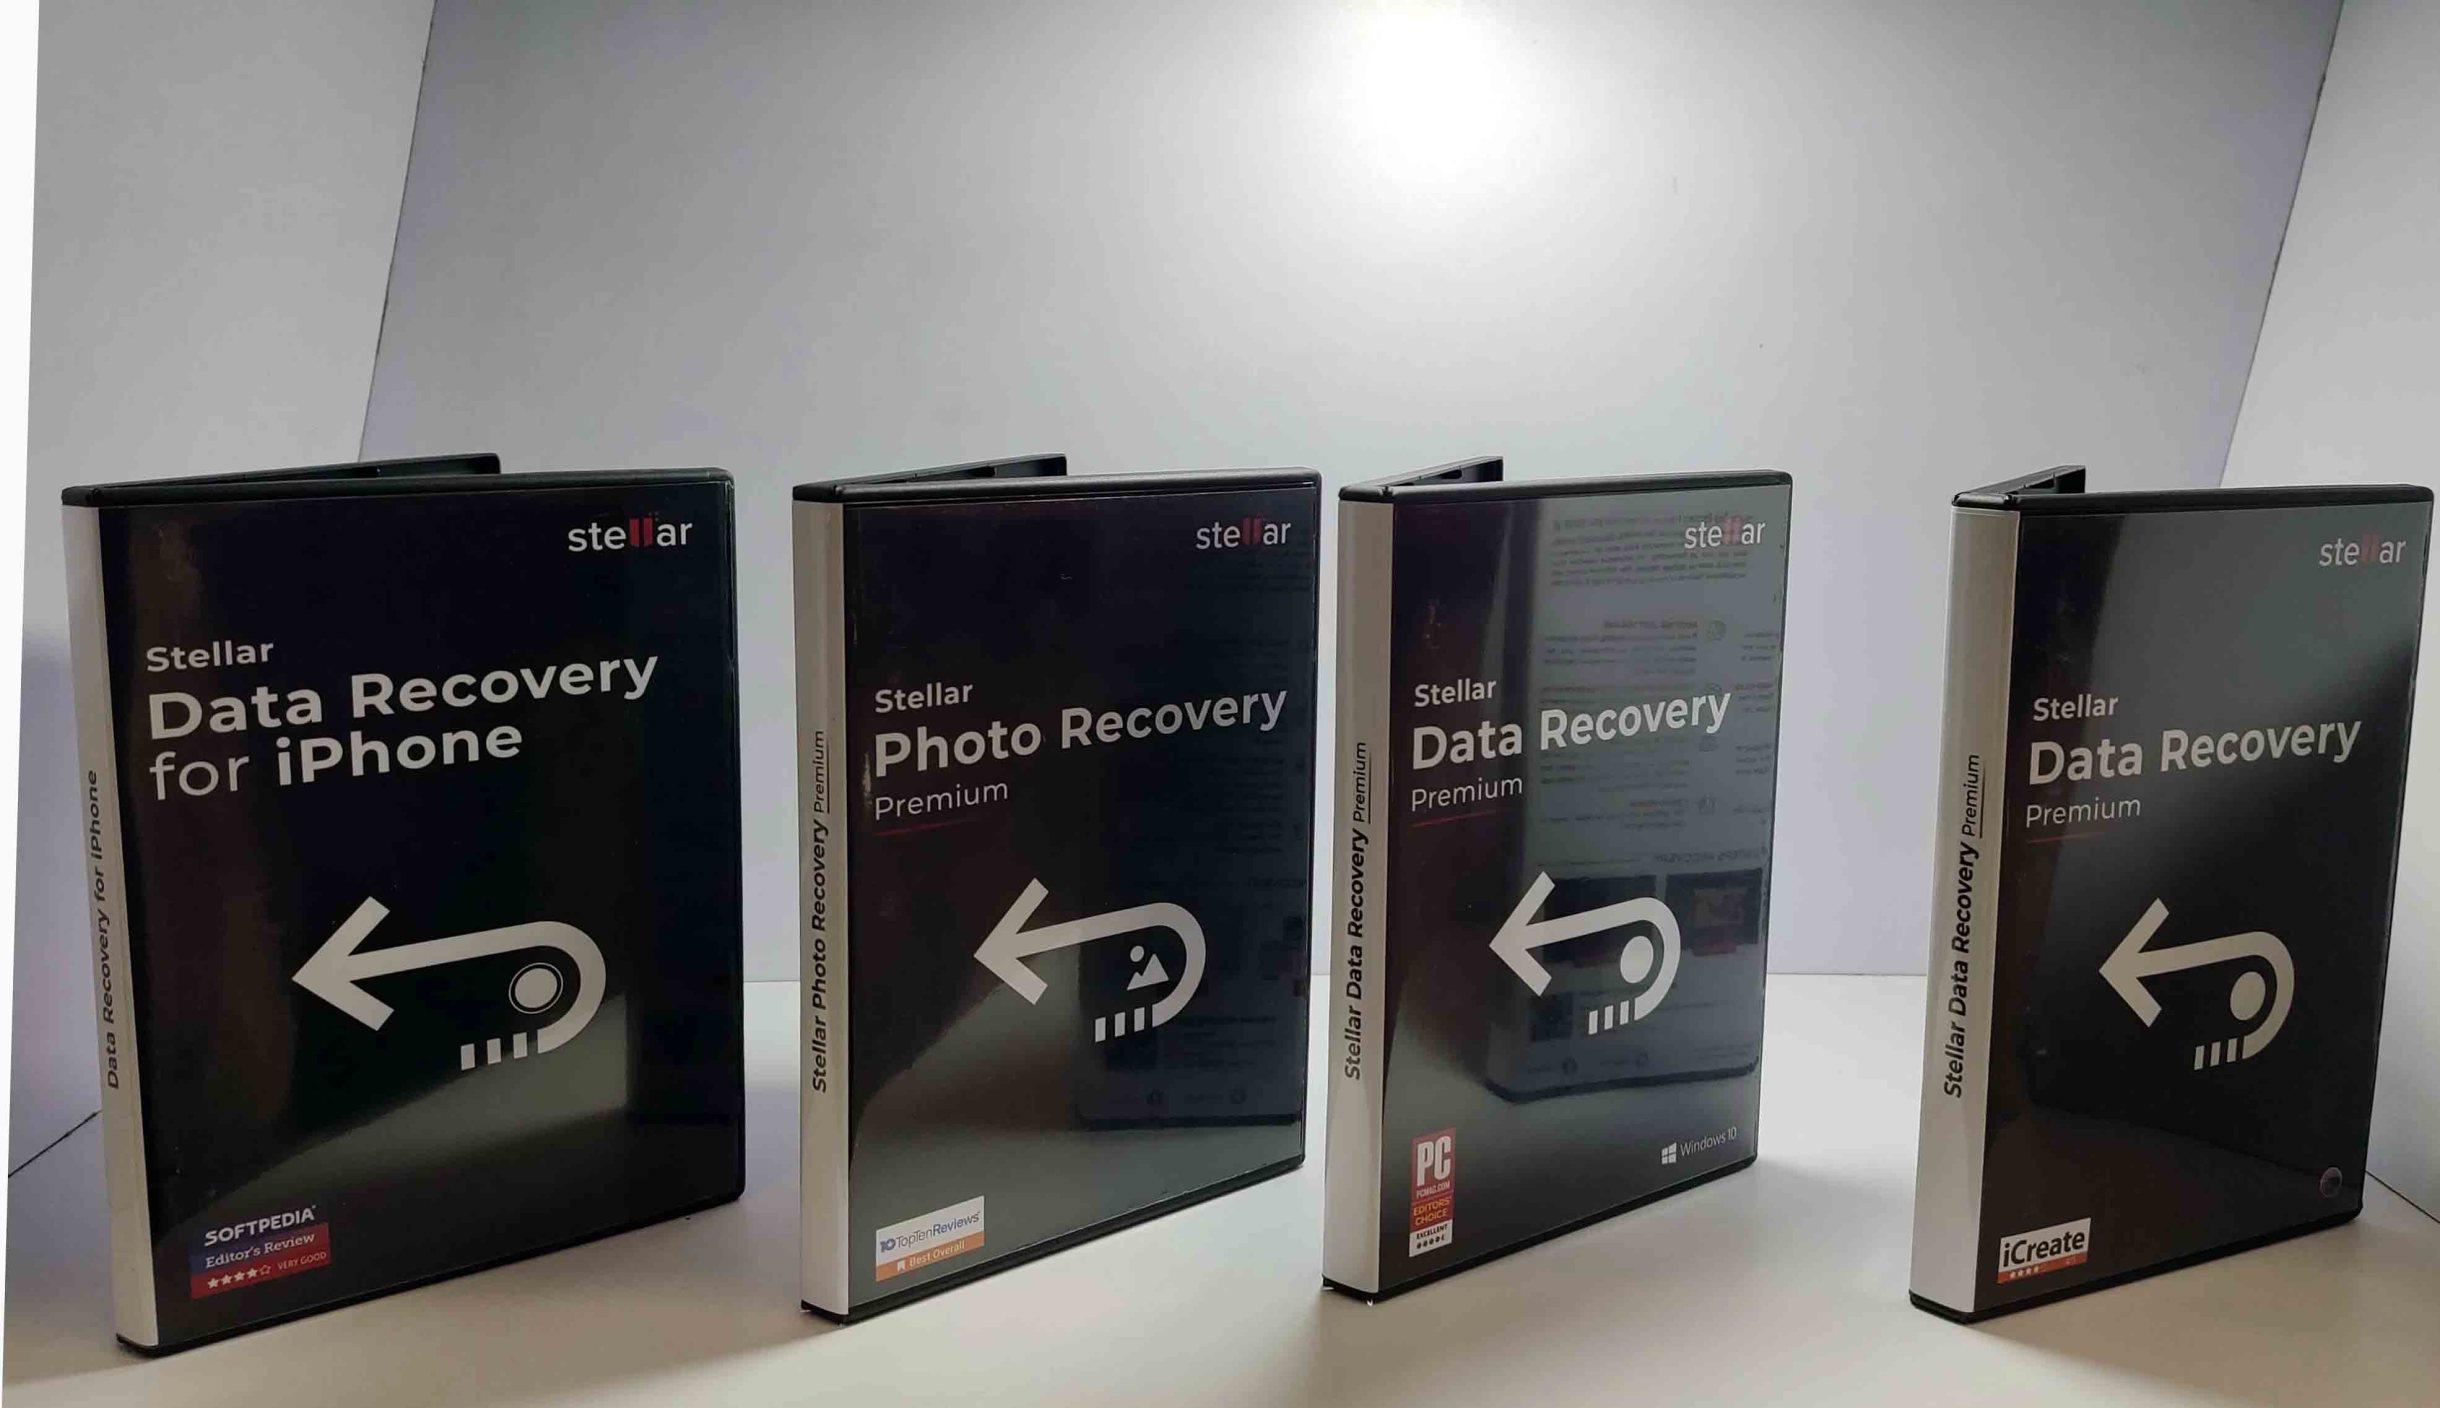 Stellar Data Recovery Techniblogic